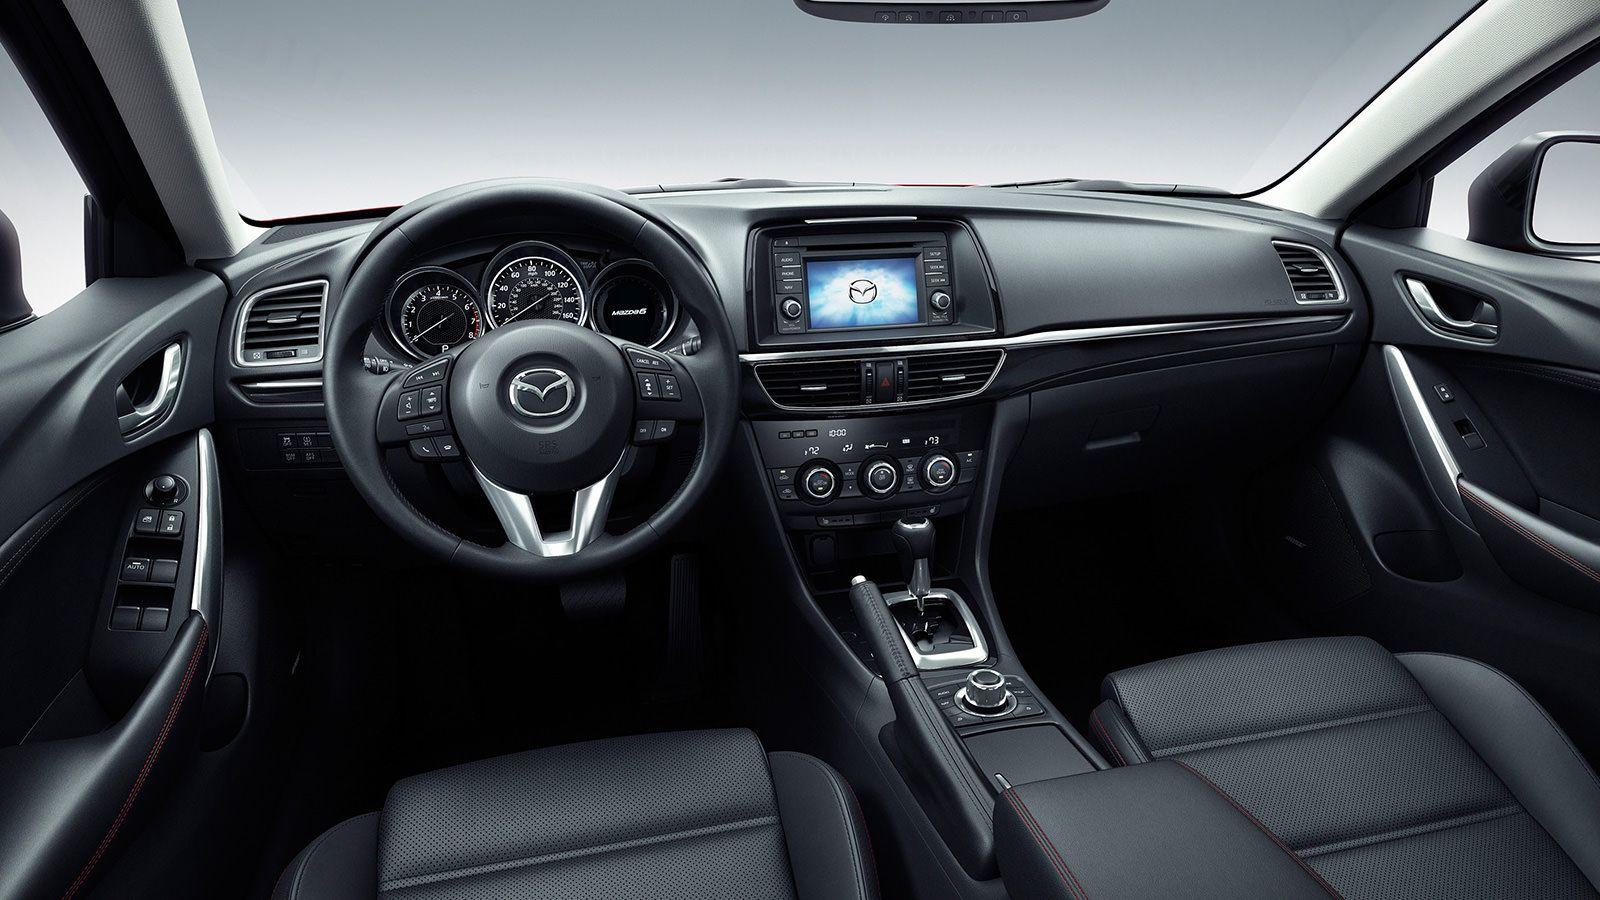 Mazda 6 2015 Interior Car interior, Mazda 6, Interior